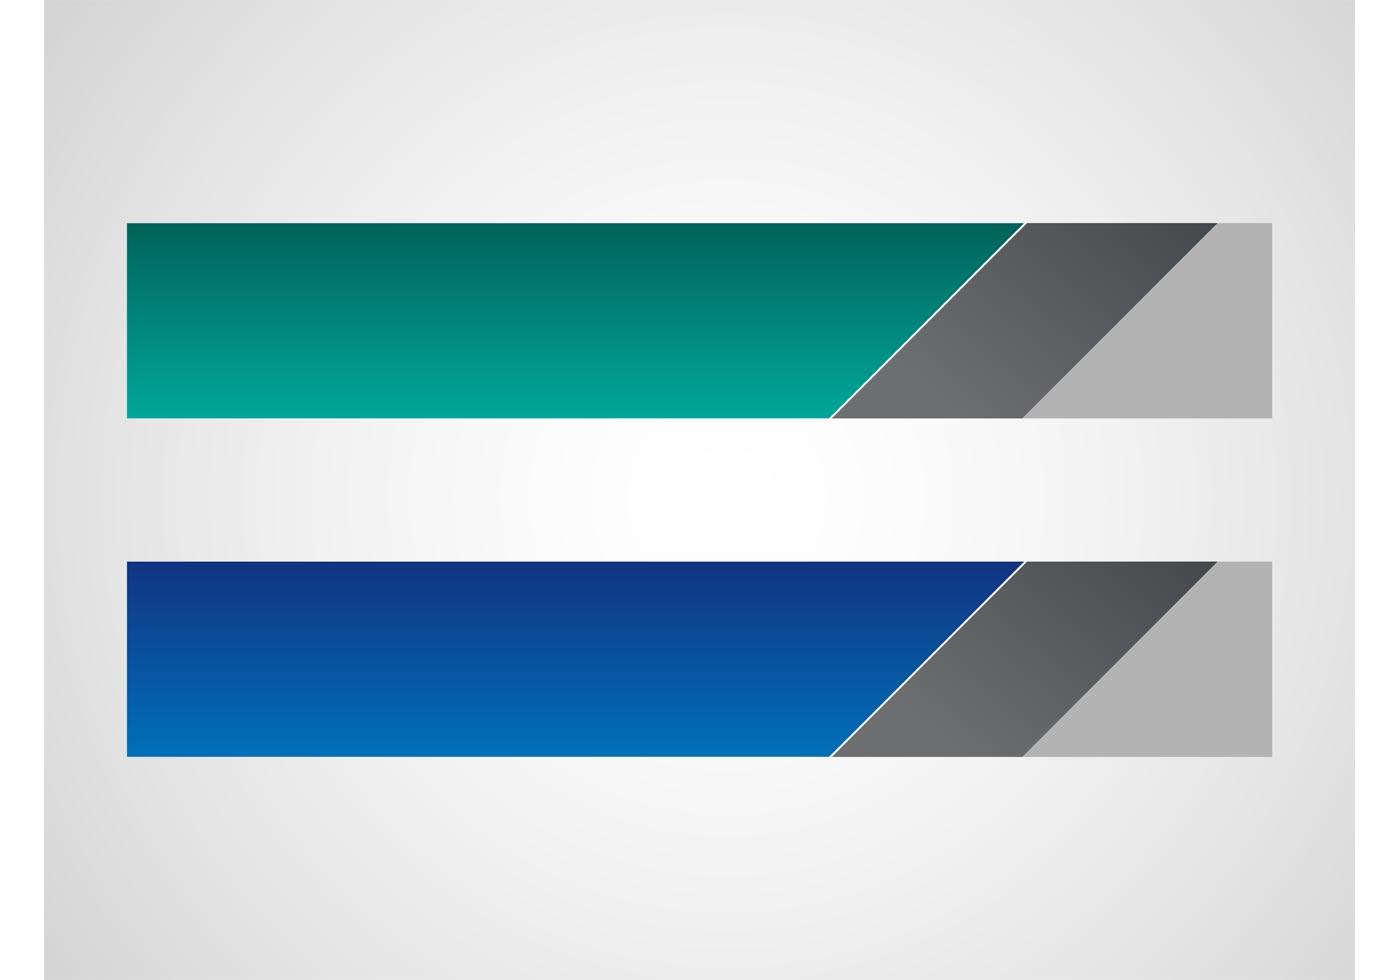 Vector Banners Designs - Download Free Vector Art, Stock ...